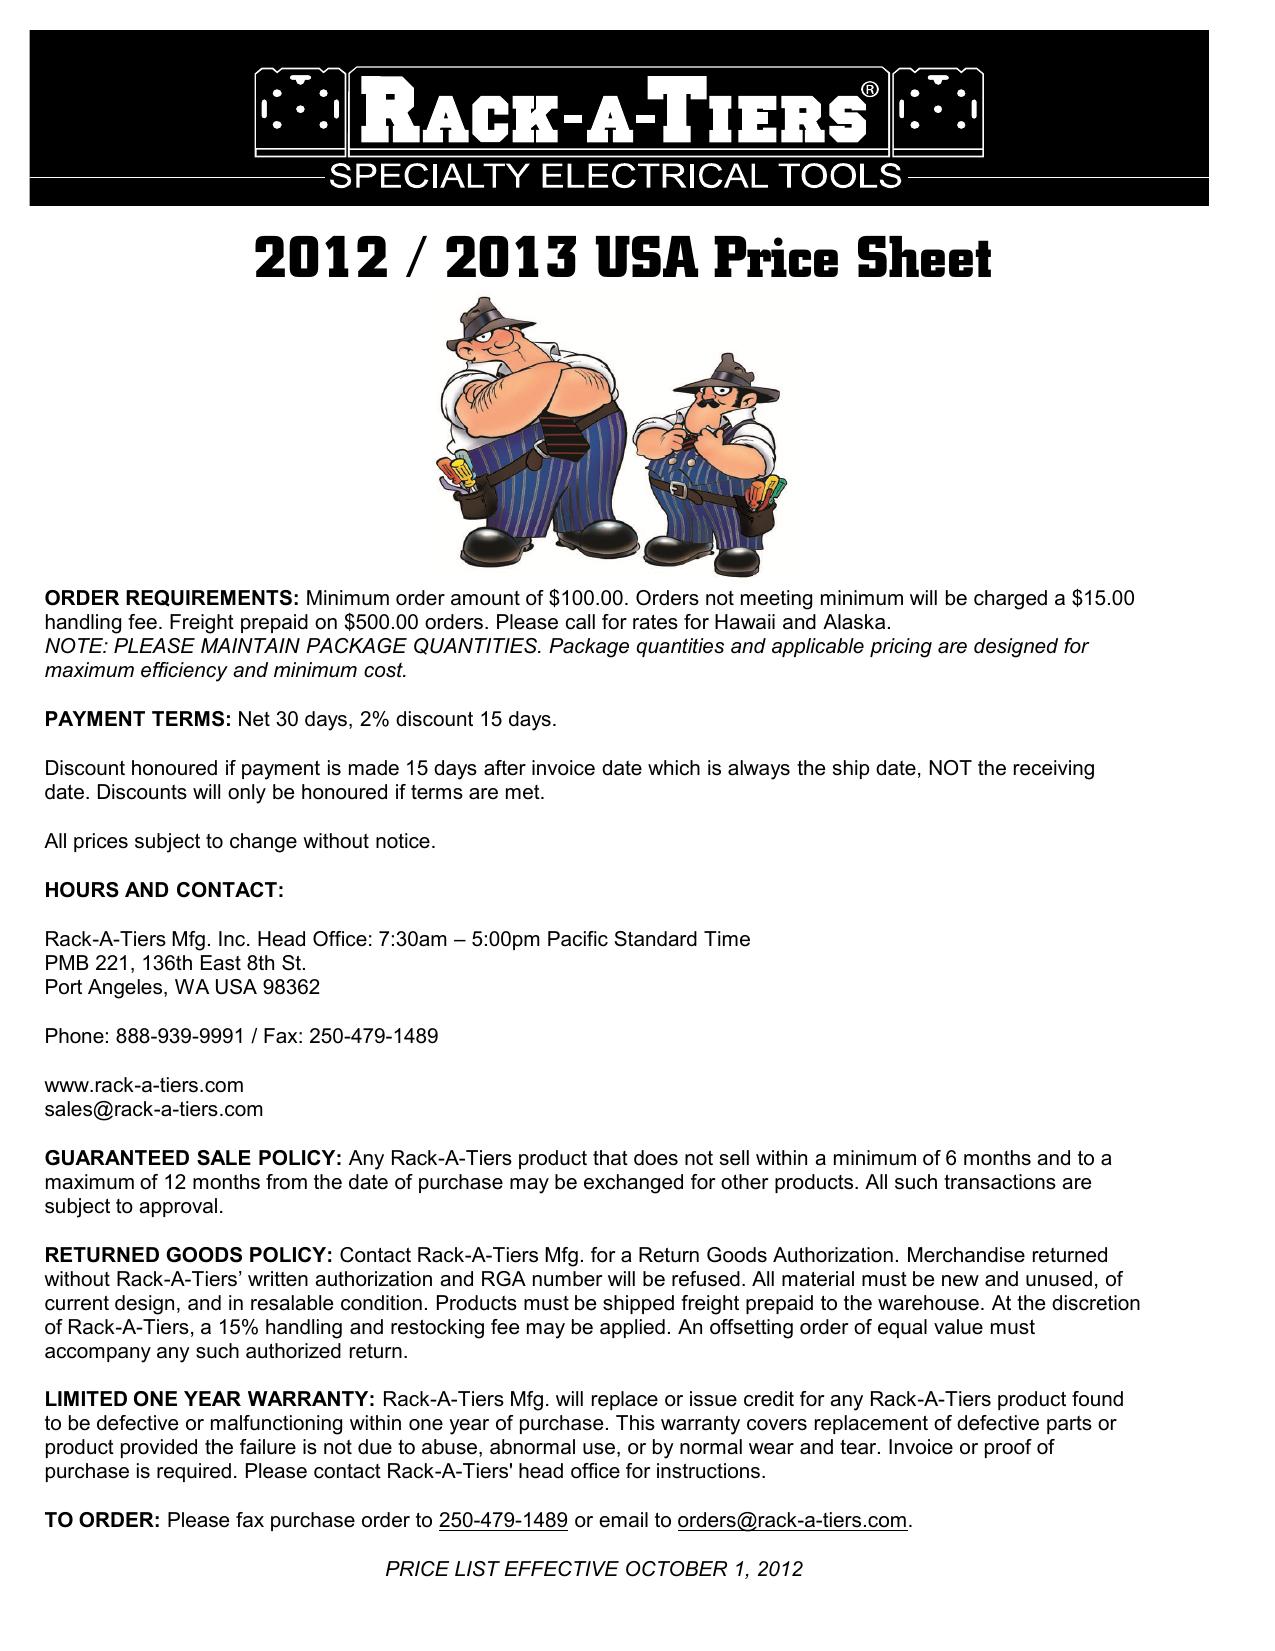 "Rack-A-Tiers® 70861BRP1 6"" Packaged Hex Bit Brown"